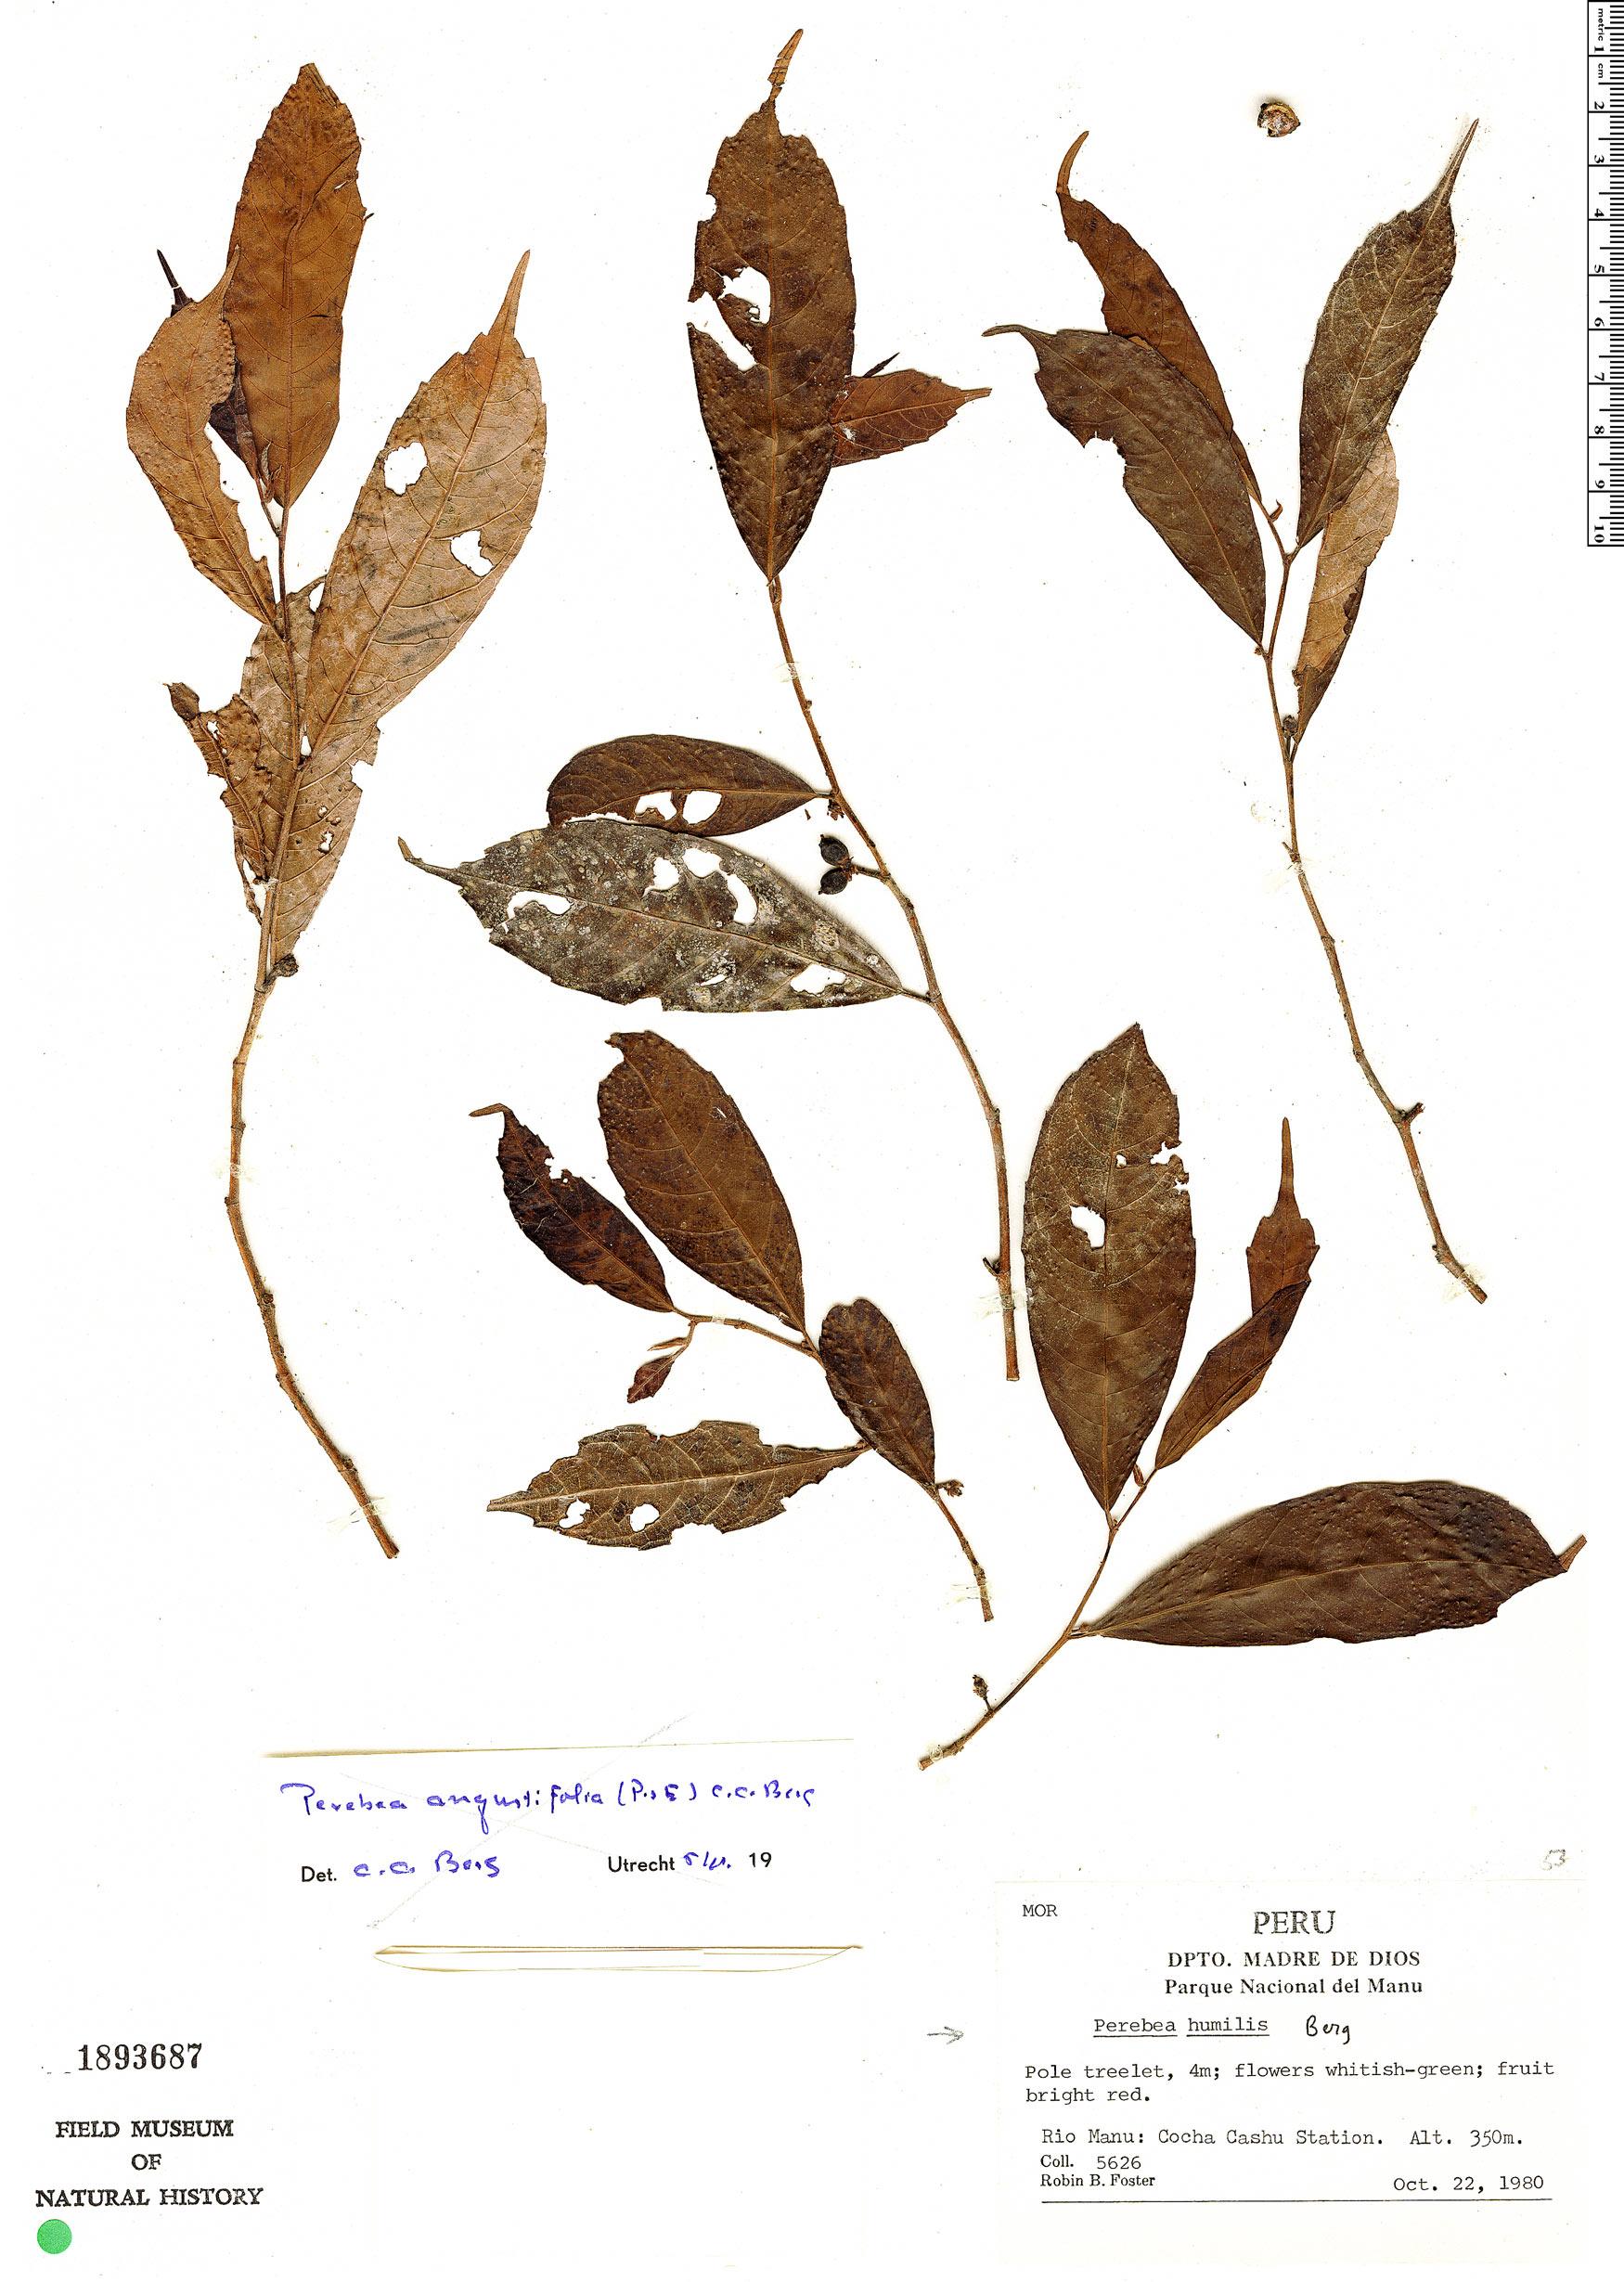 Specimen: Perebea humilis